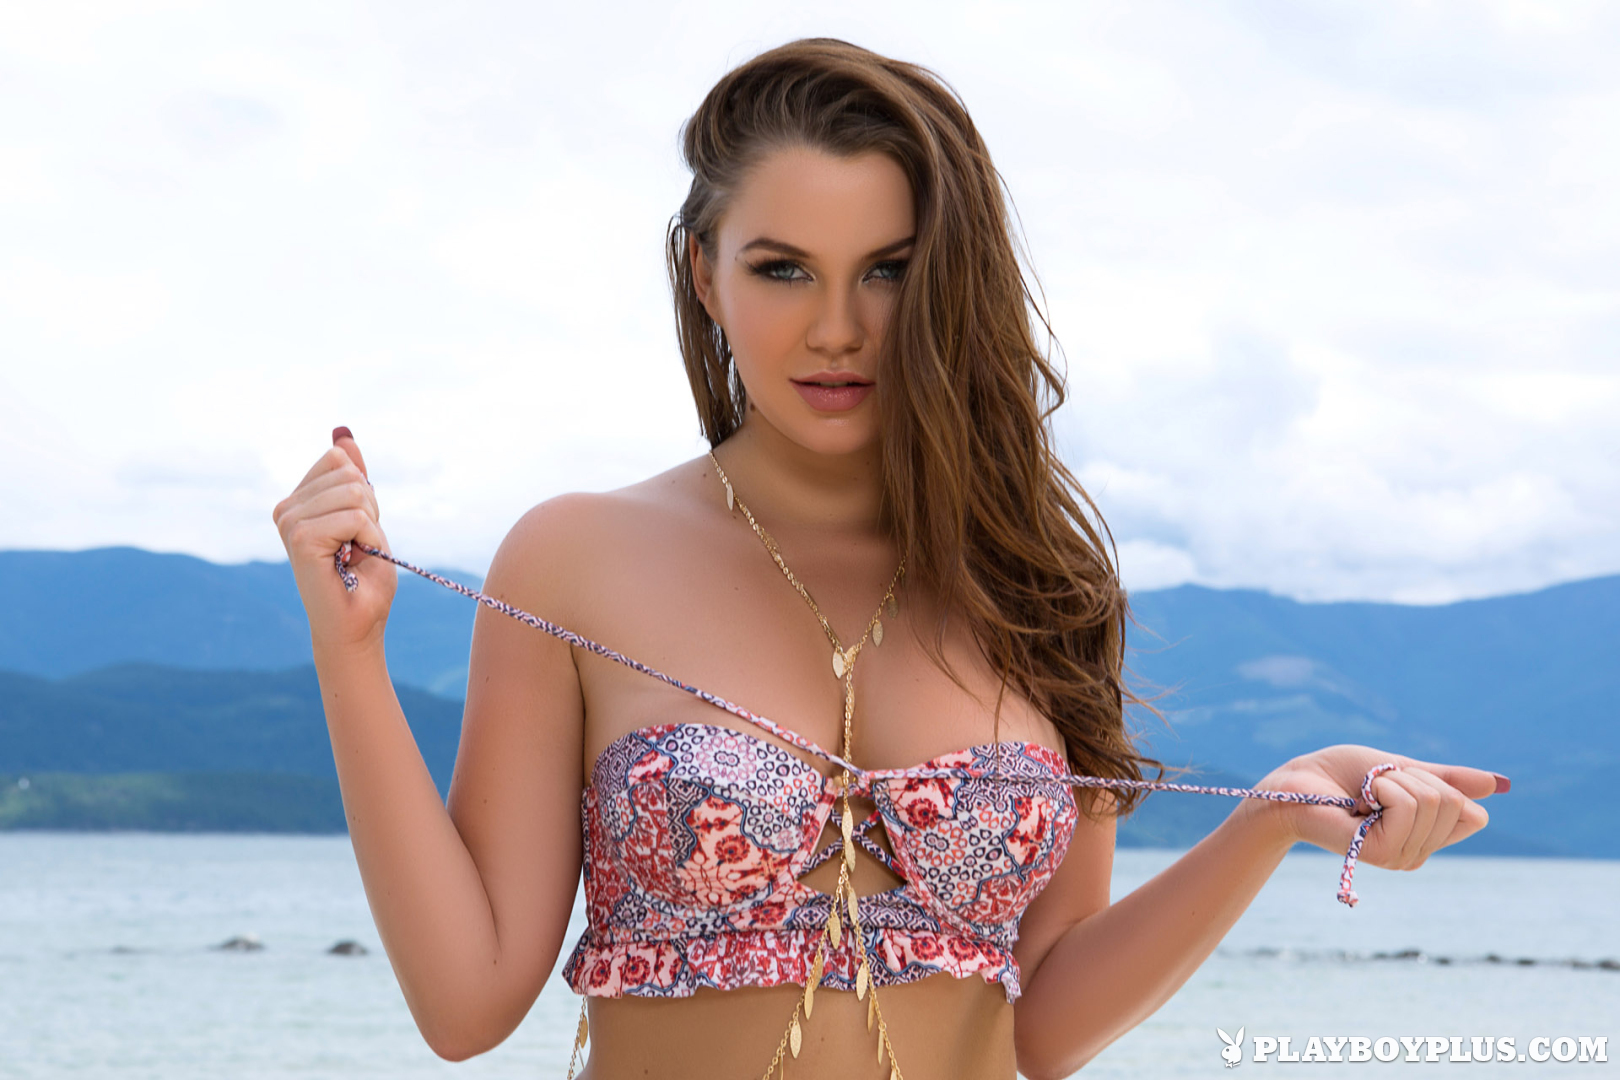 Playboy Cybergirl - Ashleigh Rae Nude Photos & Videos at Playboy Plus!